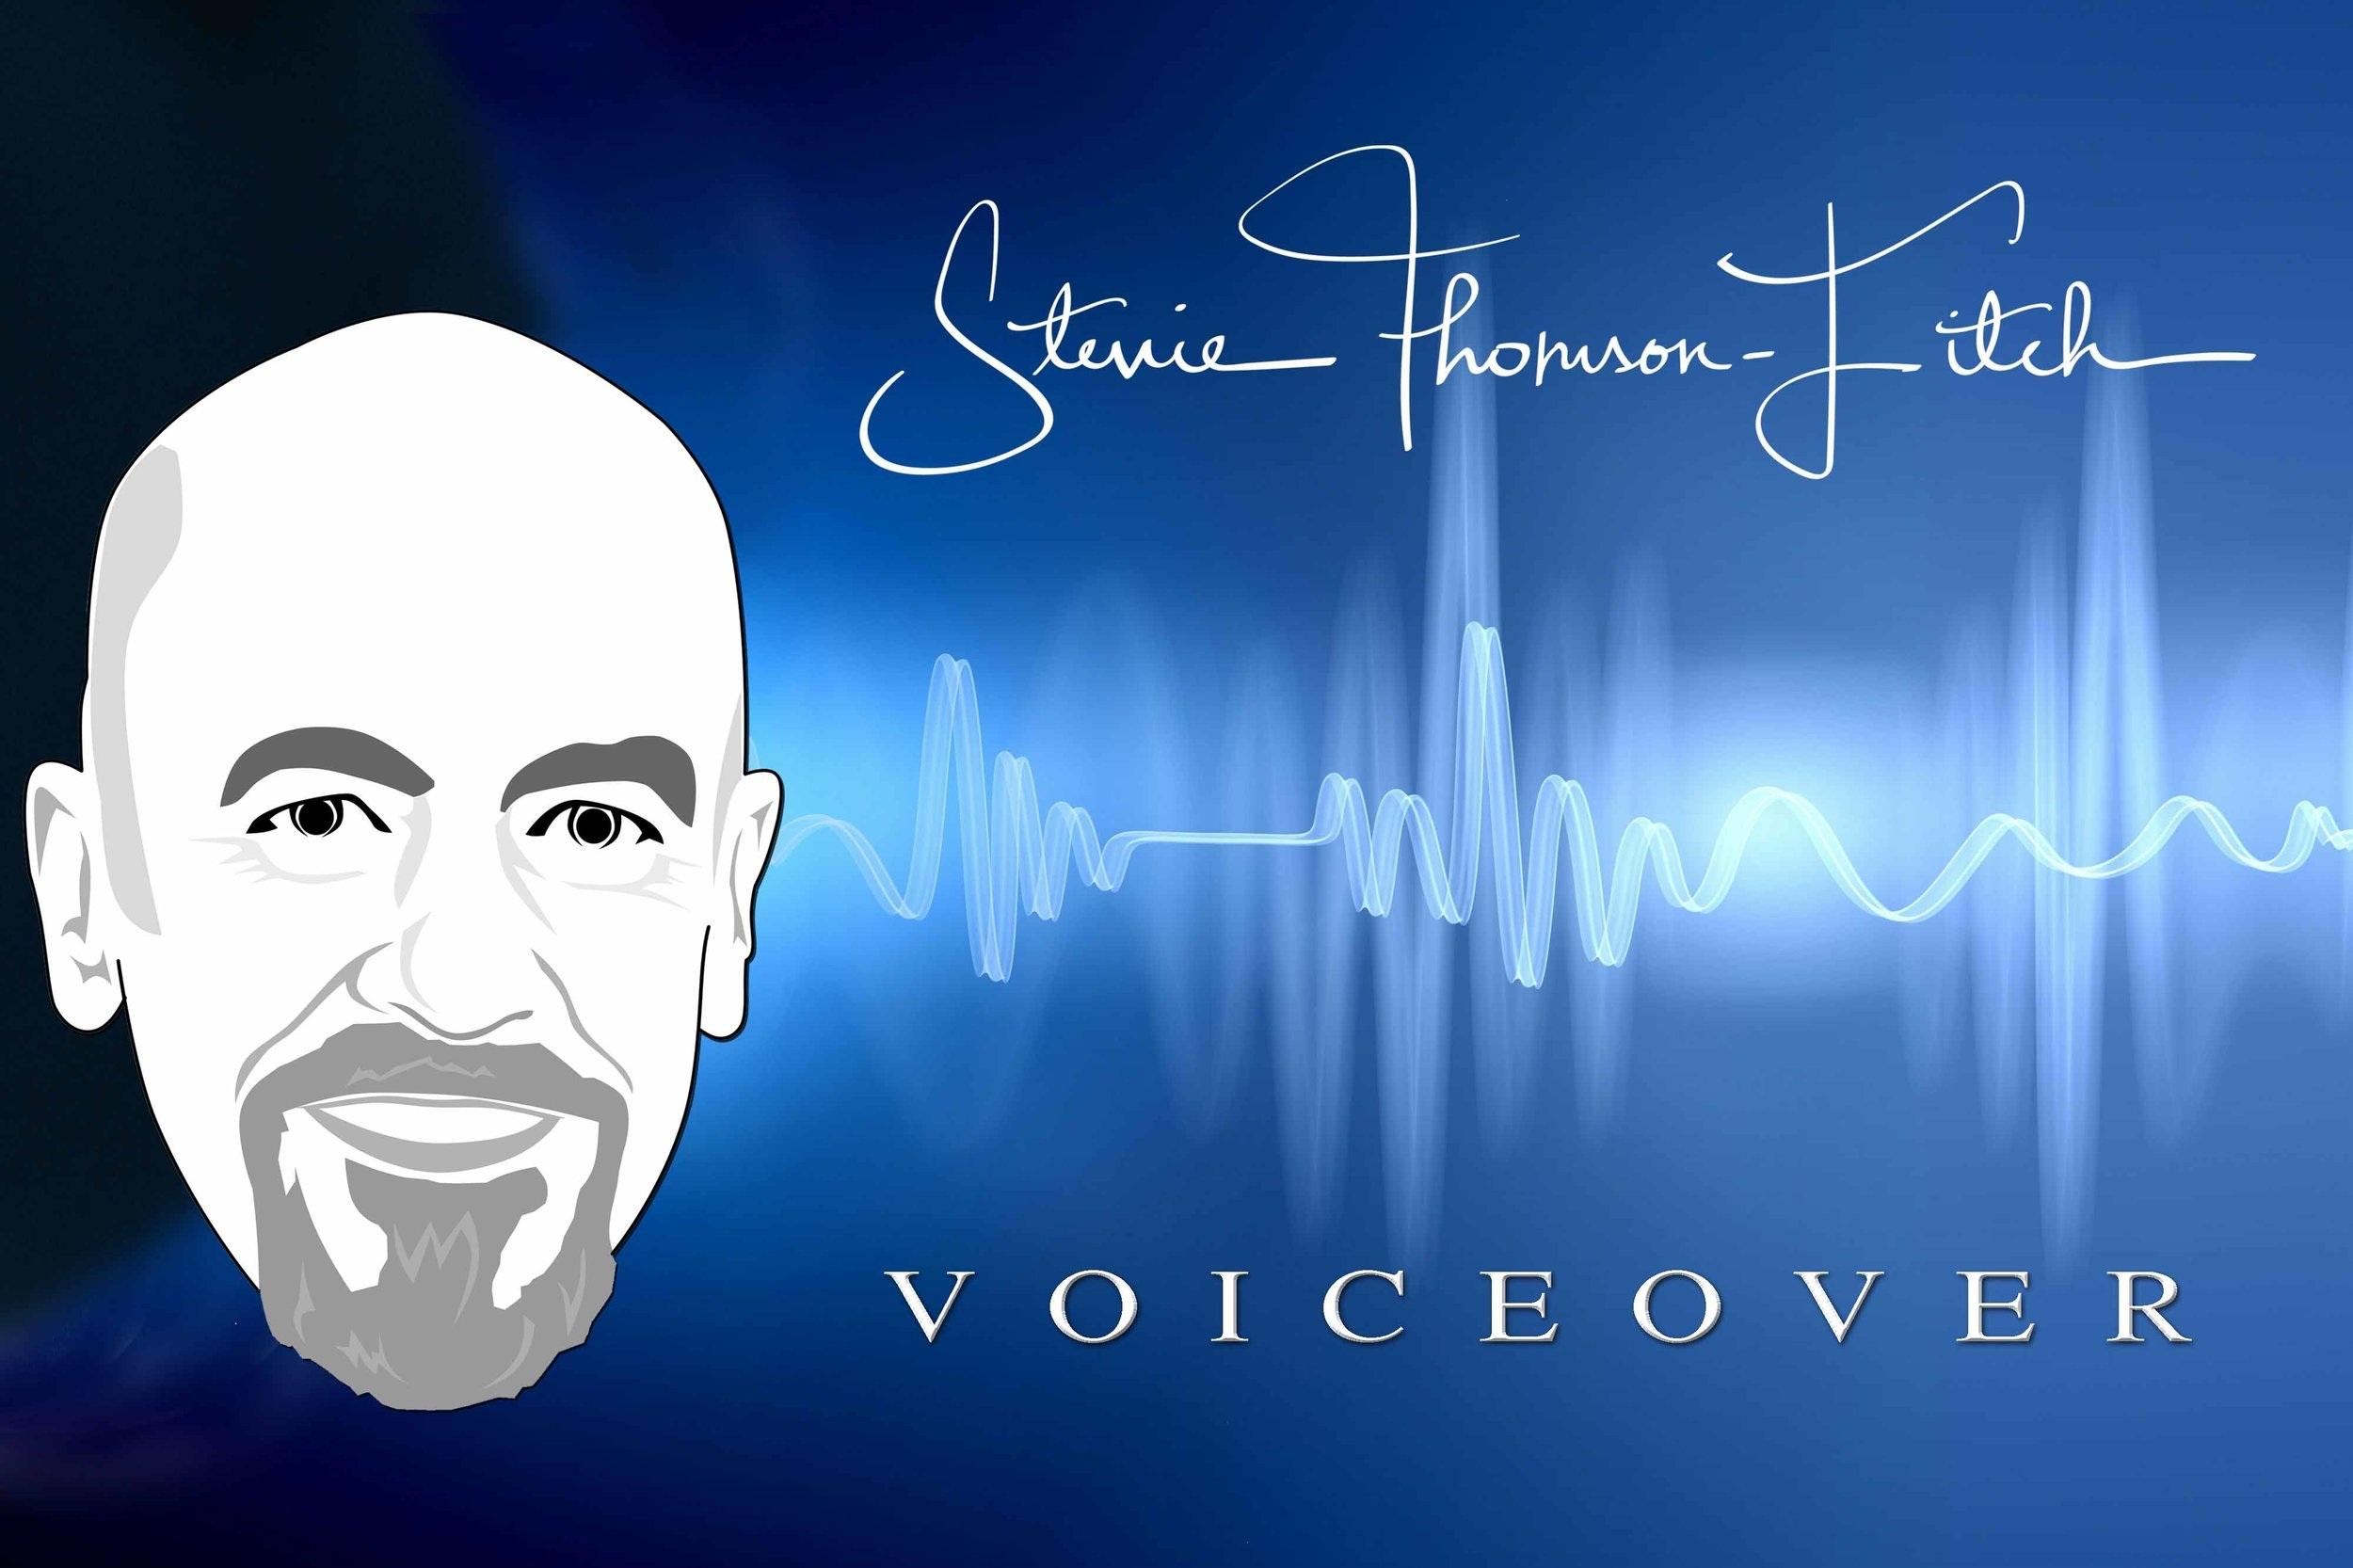 Stevie's Voice Demos - Click here to listen